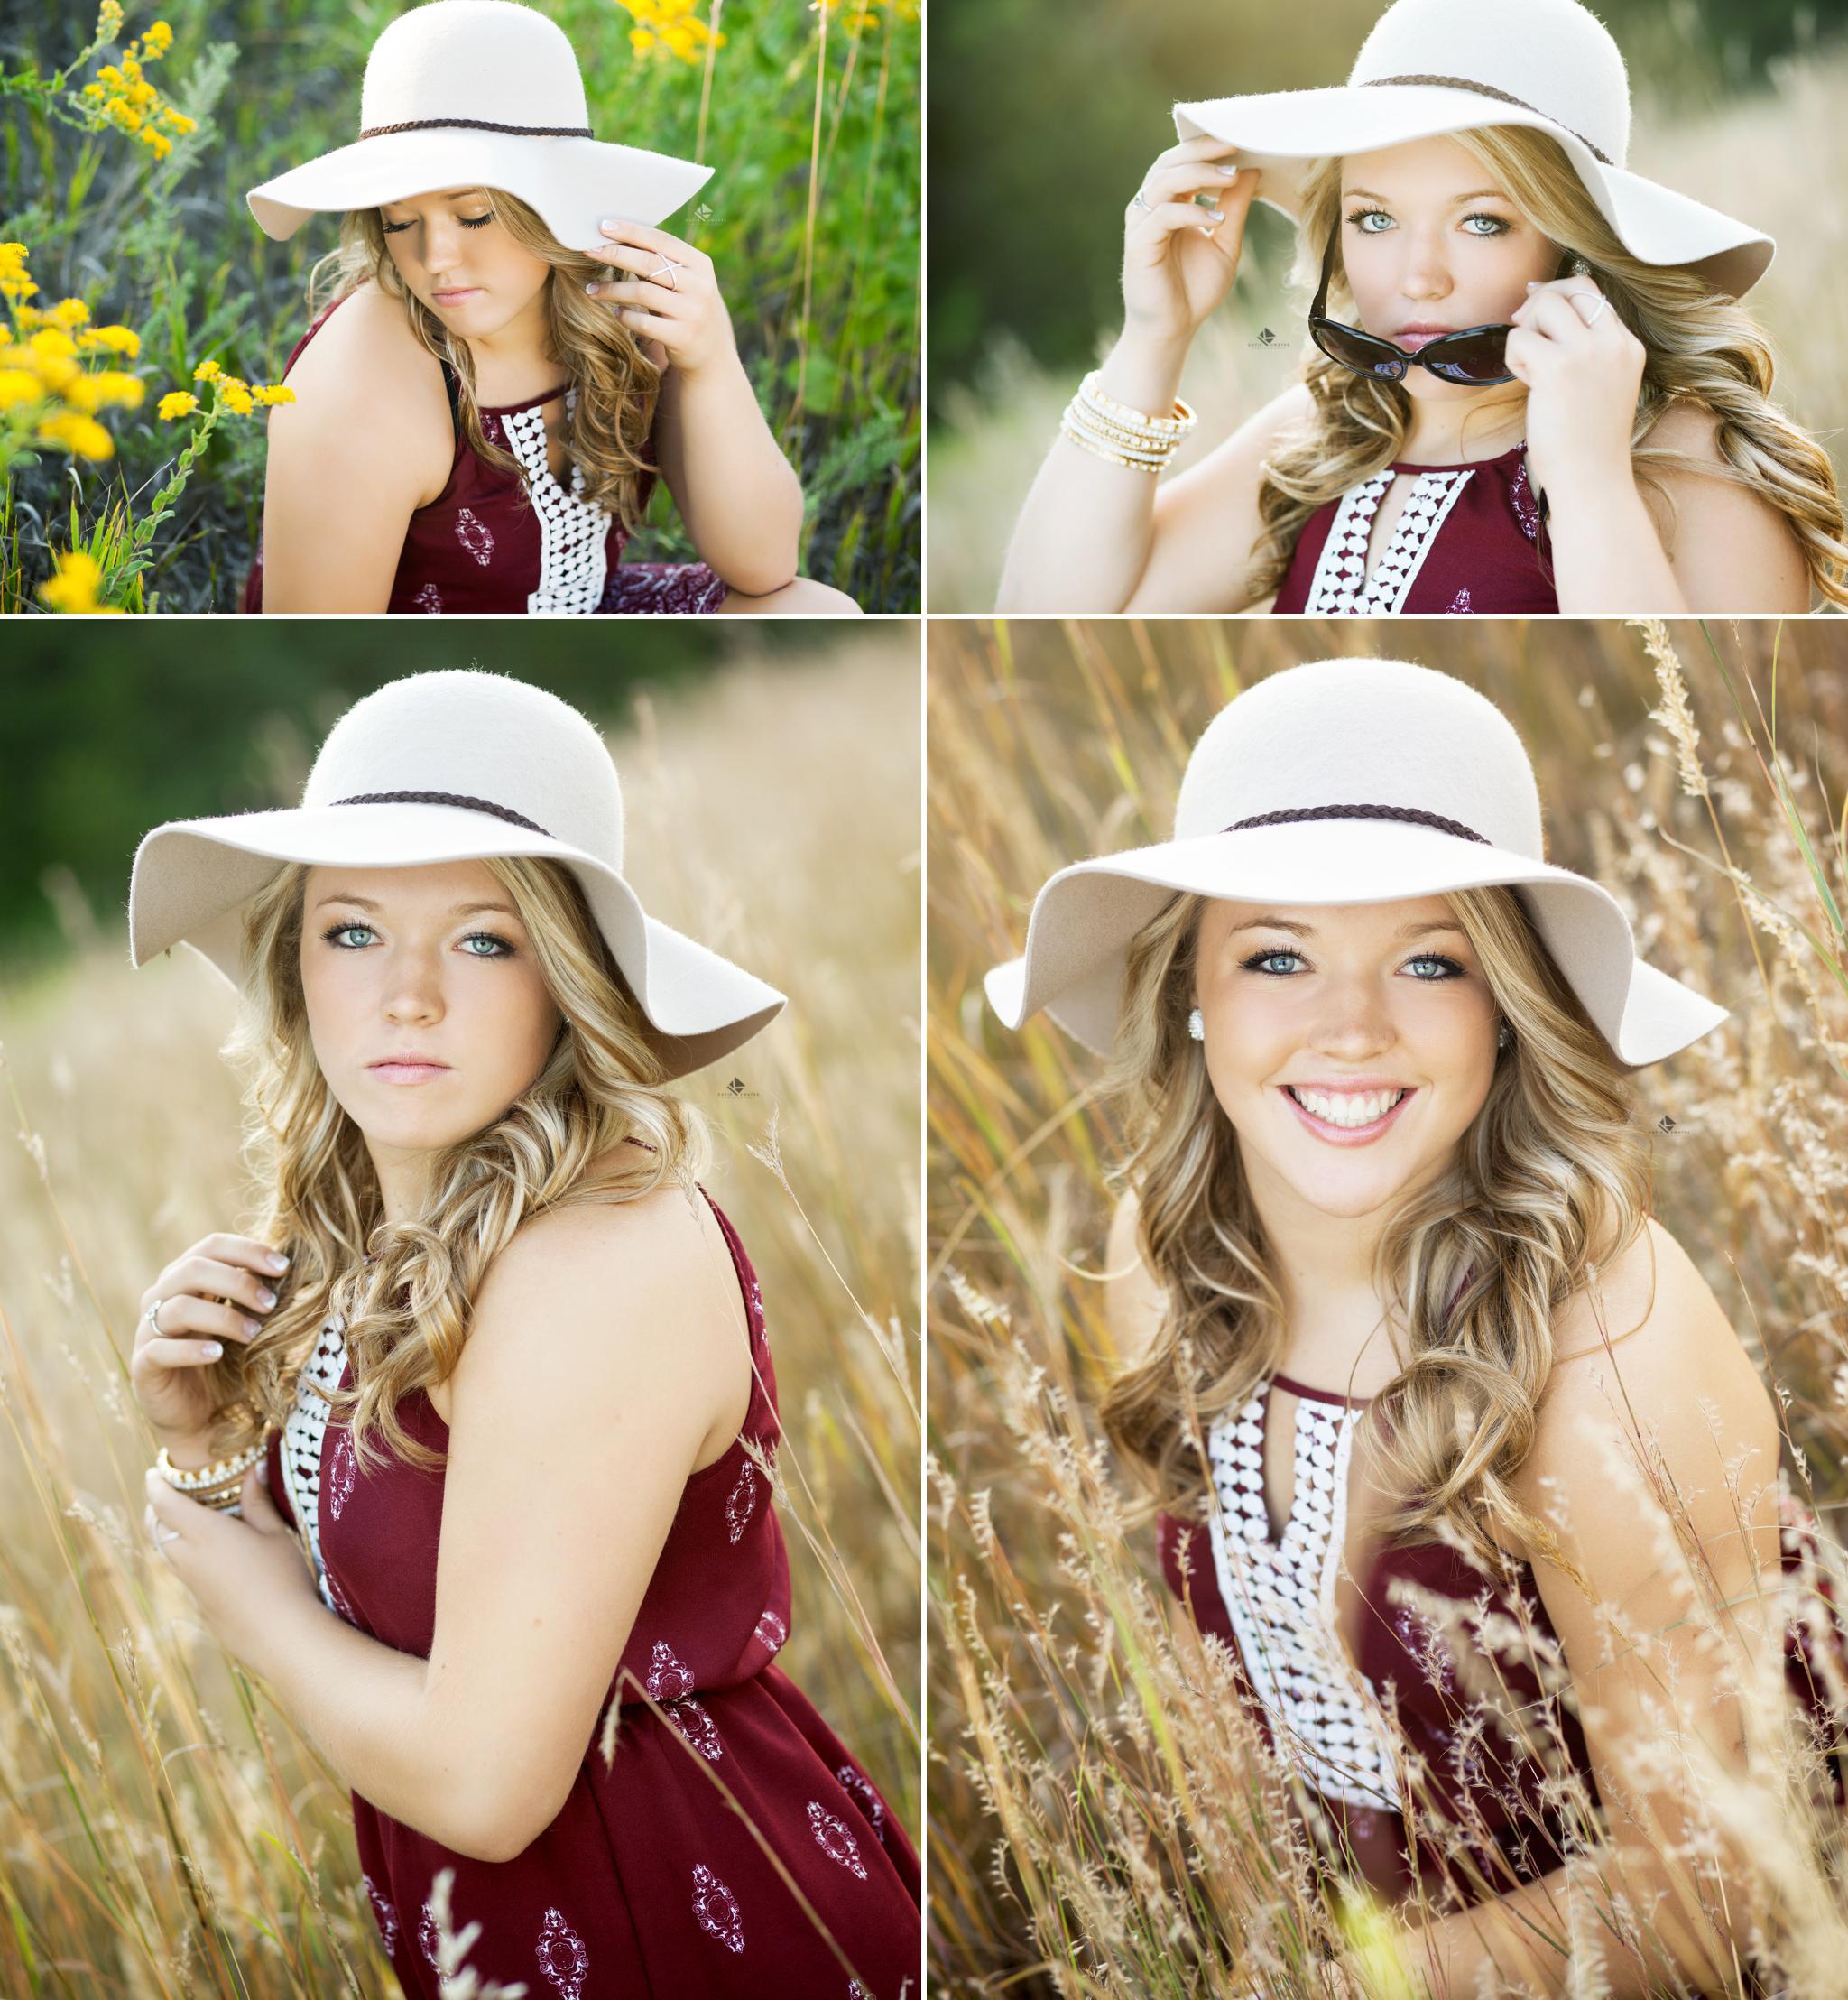 Summer Hat Senior Pictures by Katie Swatek Photography | South Dakota Senior Pictures by Katie Swatek Photography| Field Senior Pictures in South Dakota by Katie Swatek Photography